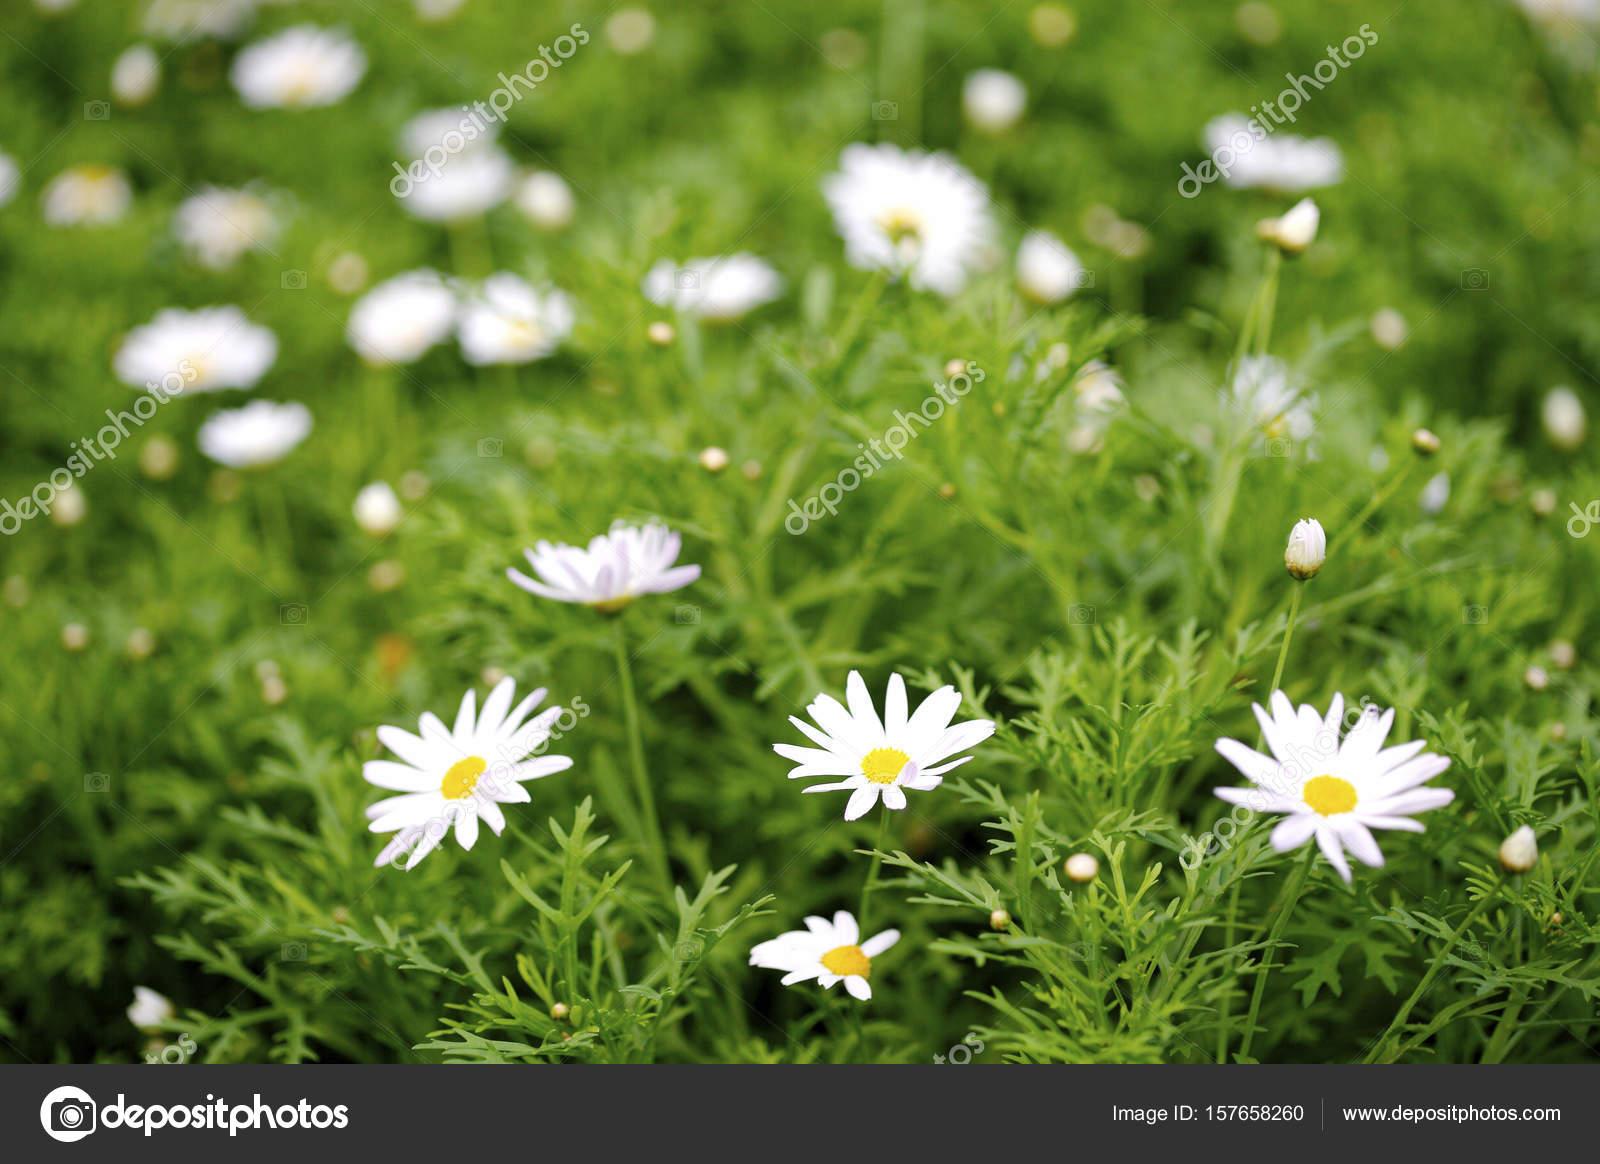 Beautiful daisy flowers stock photo topphoto 157658260 beautiful daisy flowers close up photo by topphoto izmirmasajfo